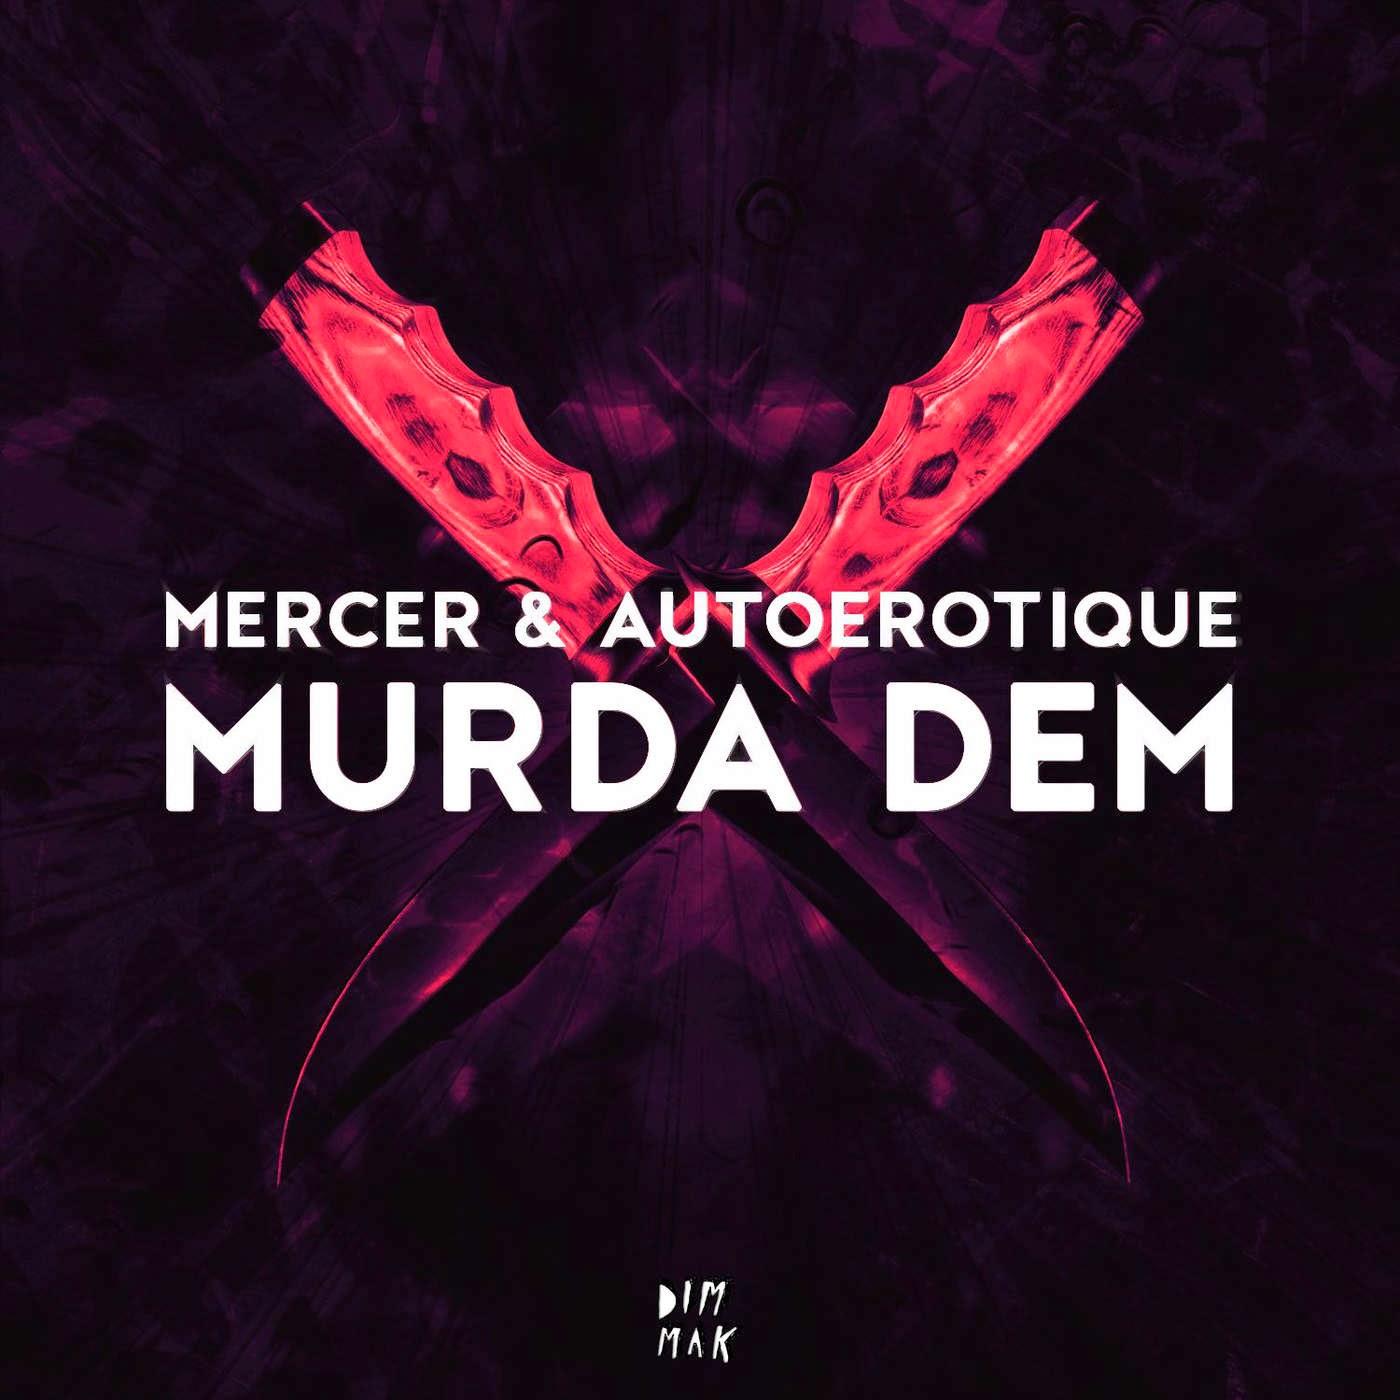 Mercer & Autoerotique - Murda Dem - Single Cover